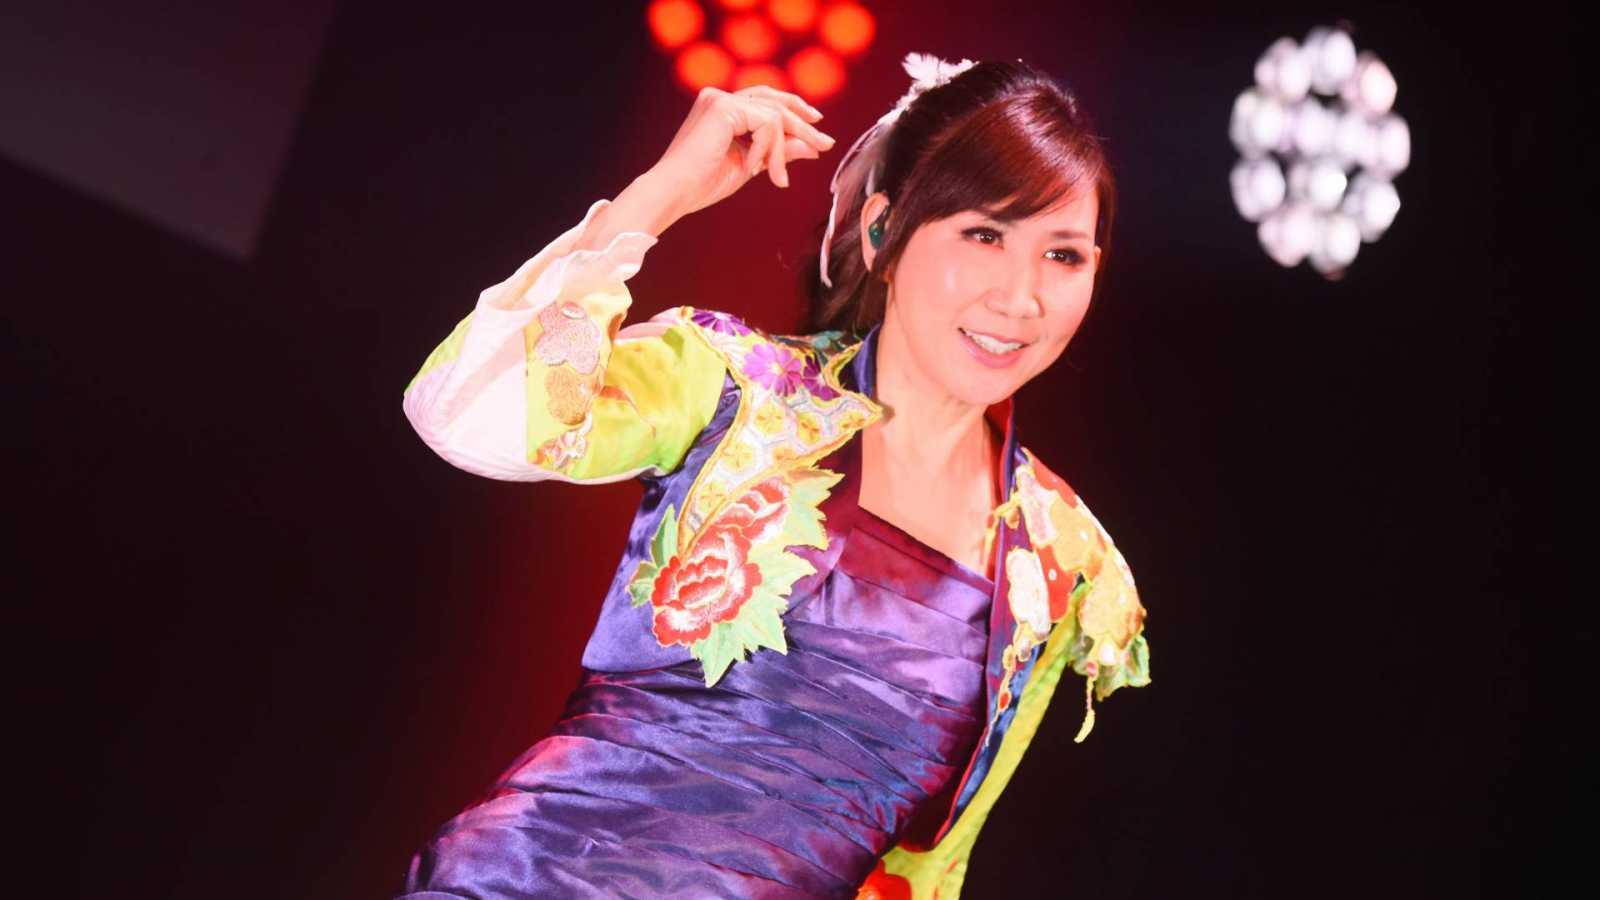 Yoko Takahashi at 17th Tokyo International Music Market © Tokyo International Music Market (TIMM)